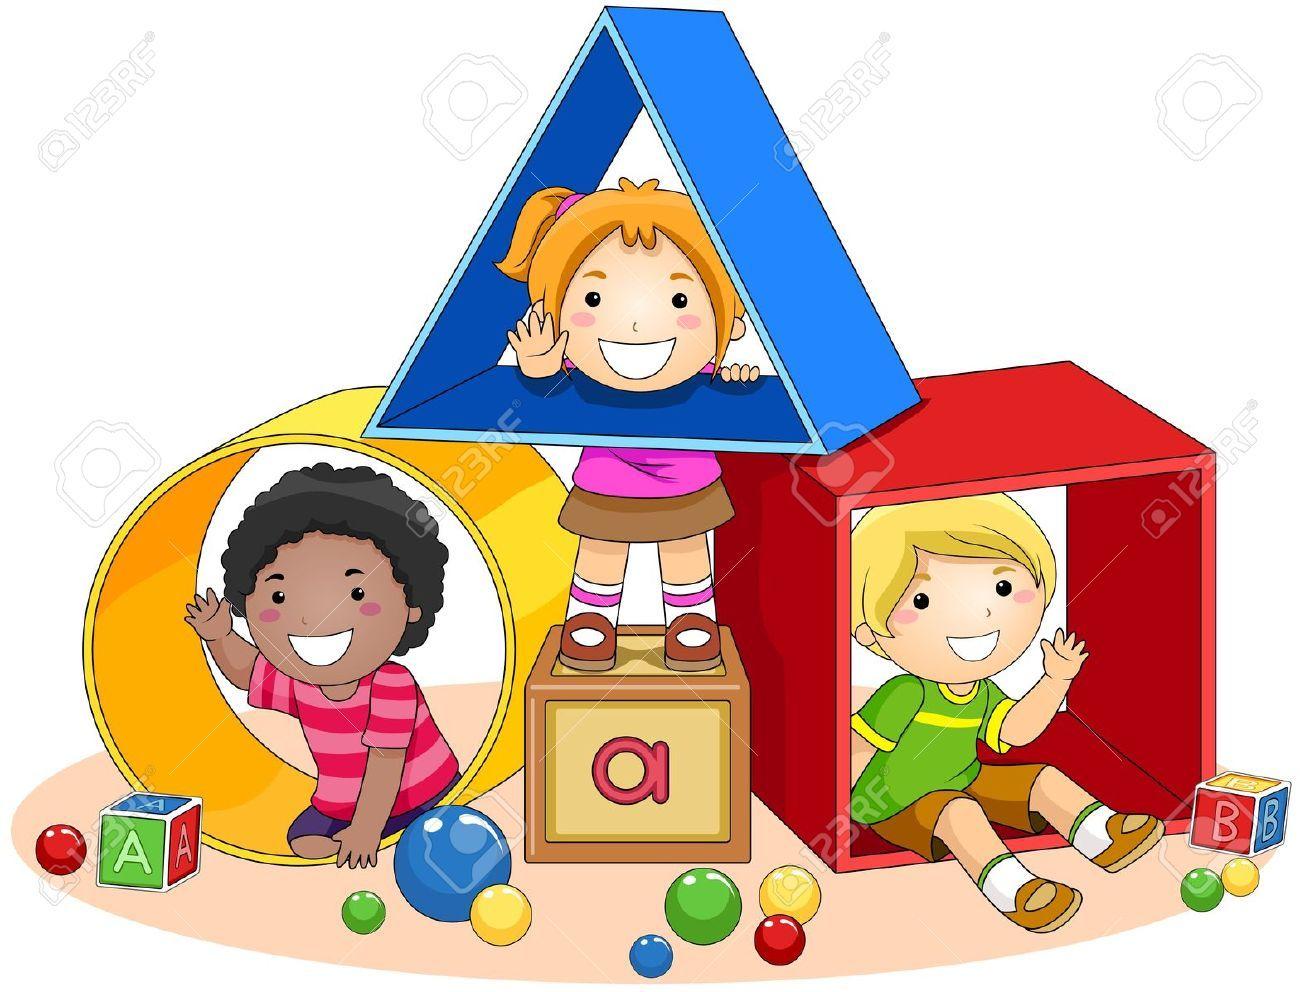 Preschool kids clipart 6 » Clipart Station.